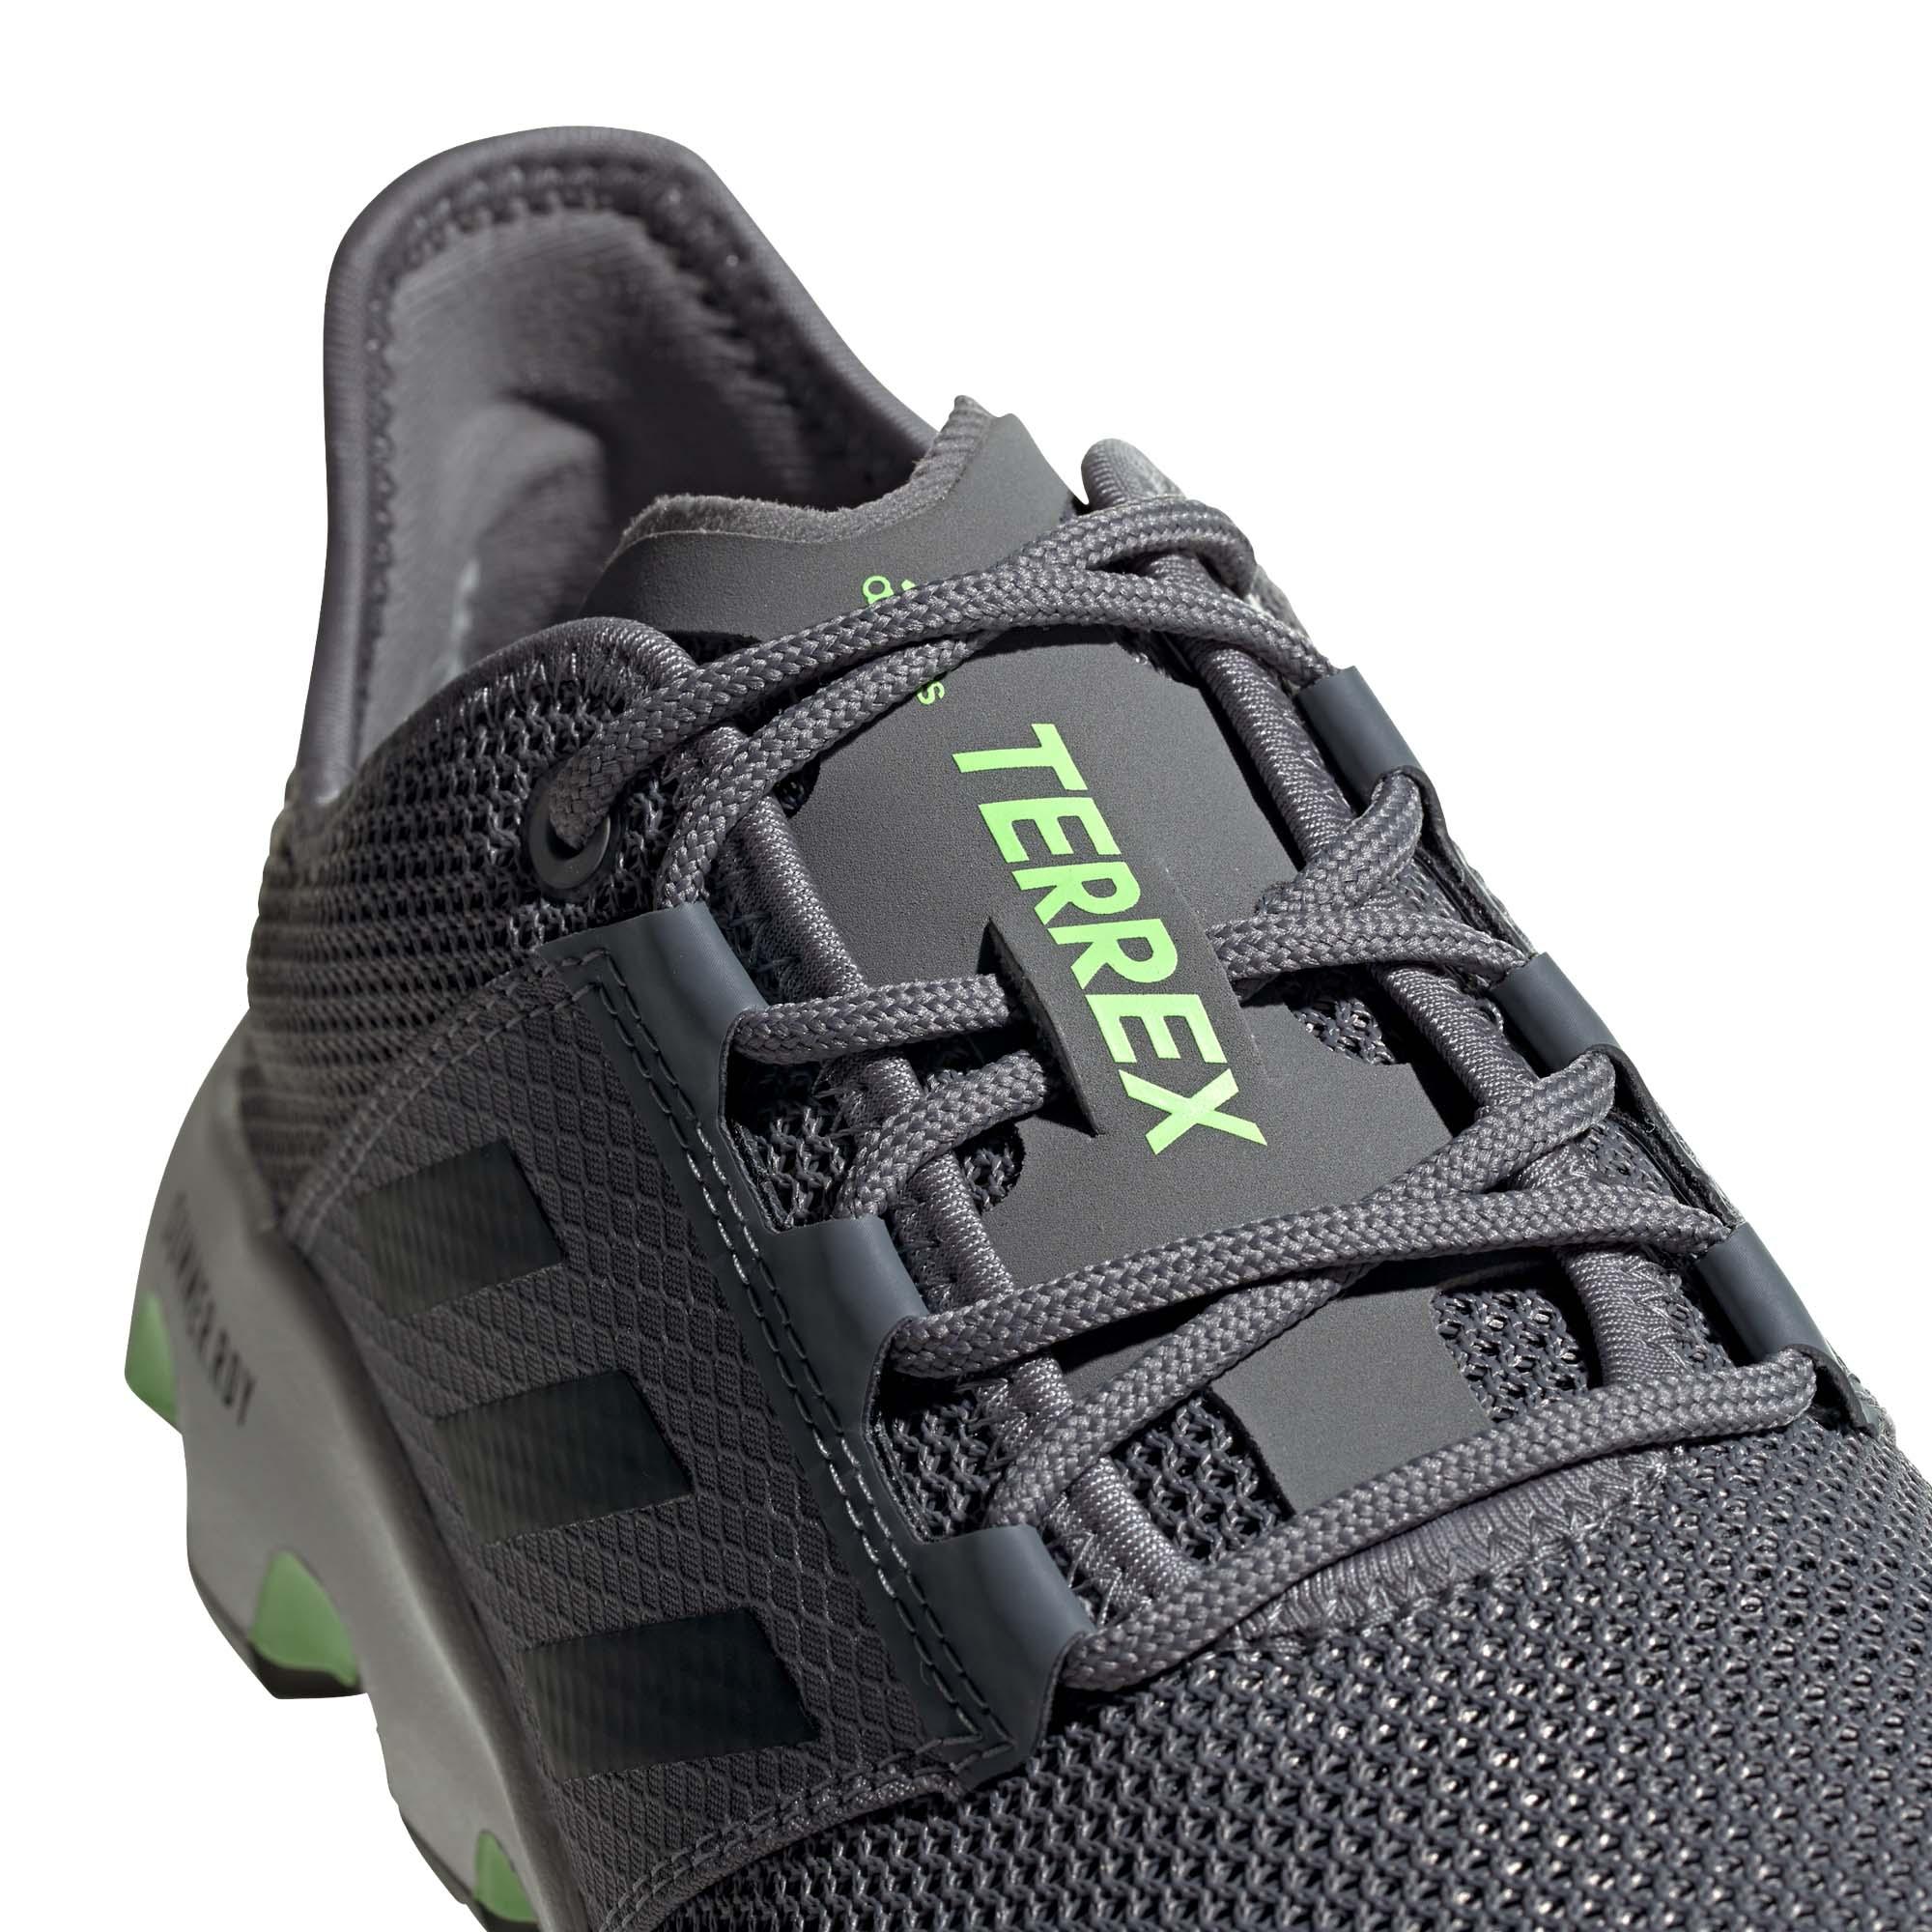 miniature 9 - Adidas Terrex Voyager Homme Trail Running Baskets Chaussures Gris/Noir/Vert